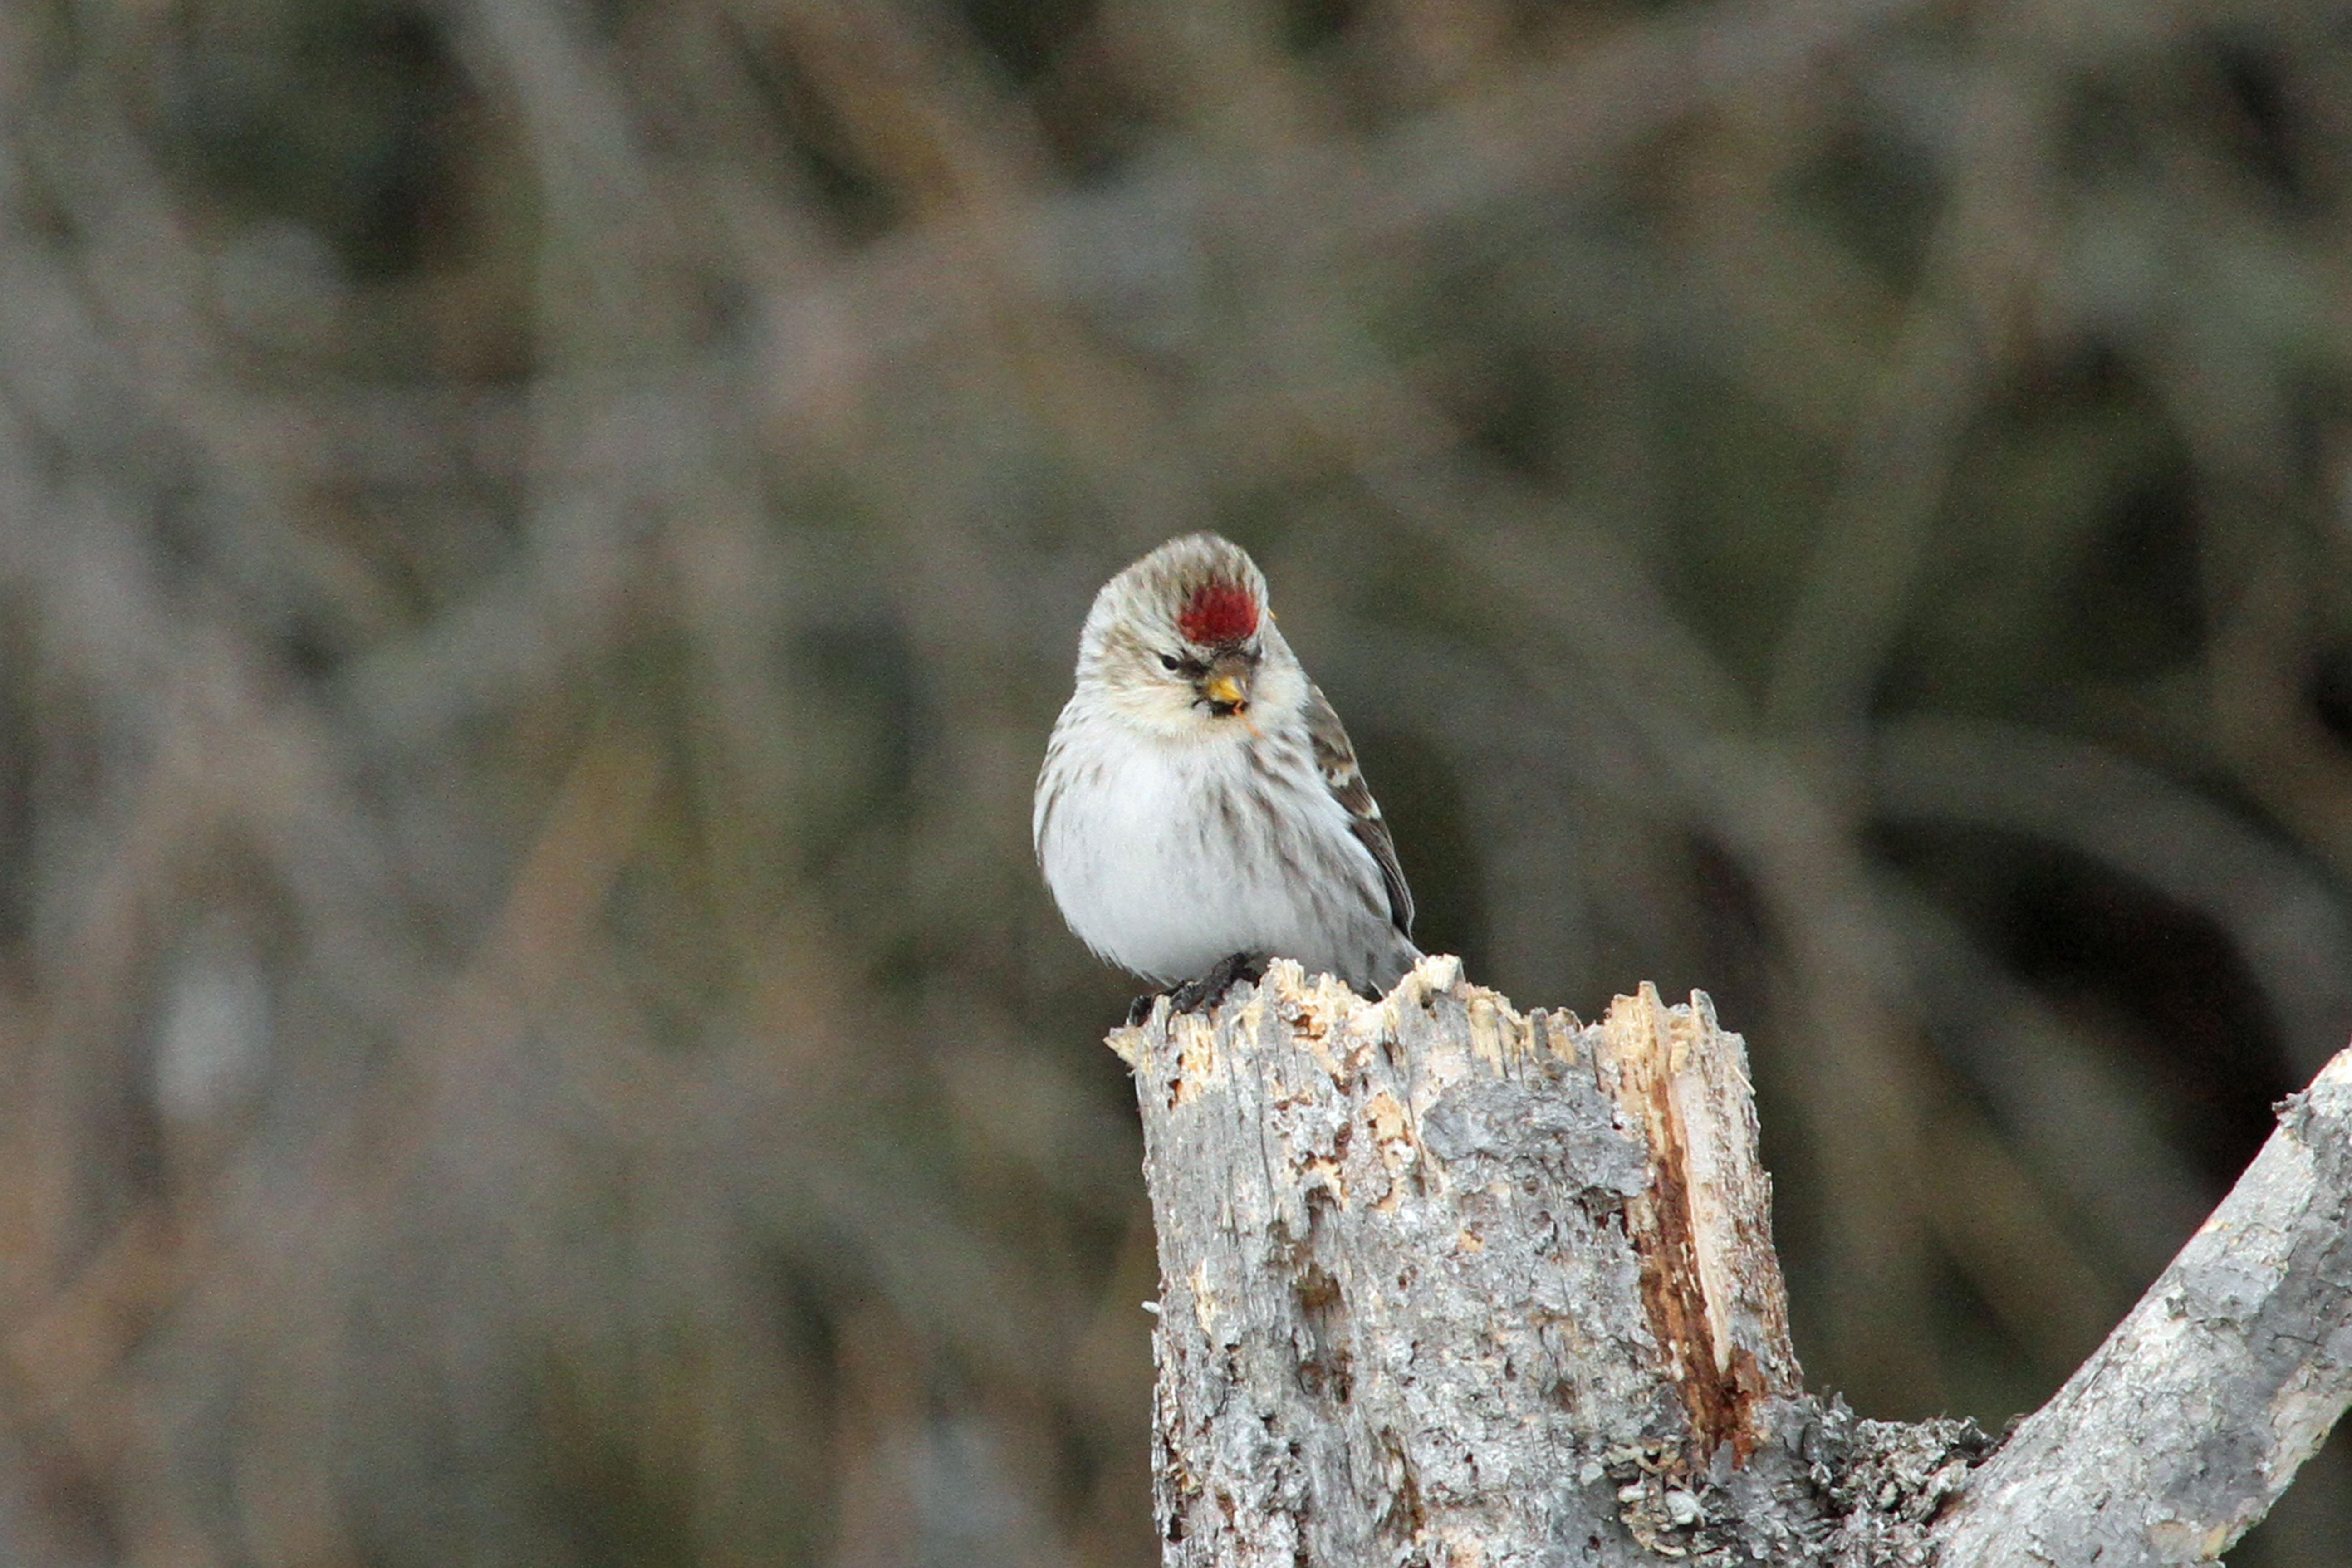 White and black short beak bird on tree branch at daytime hoary 5184x3456